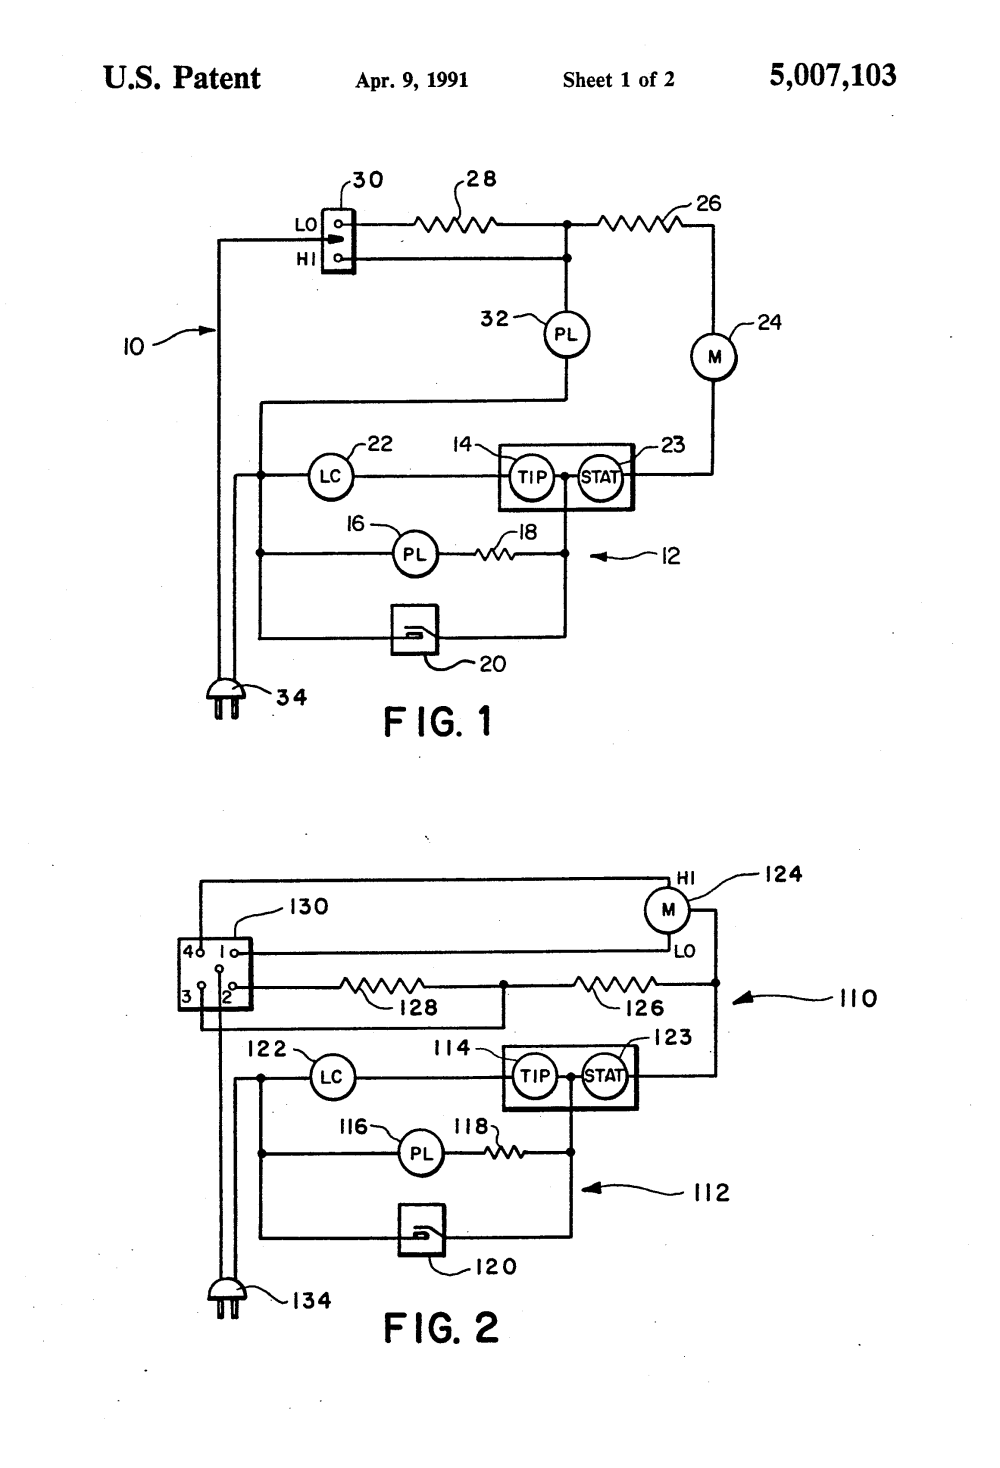 medium resolution of patton space heater wiring wiring diagram logpatton space heater wiring diagram wiring diagram today patton space